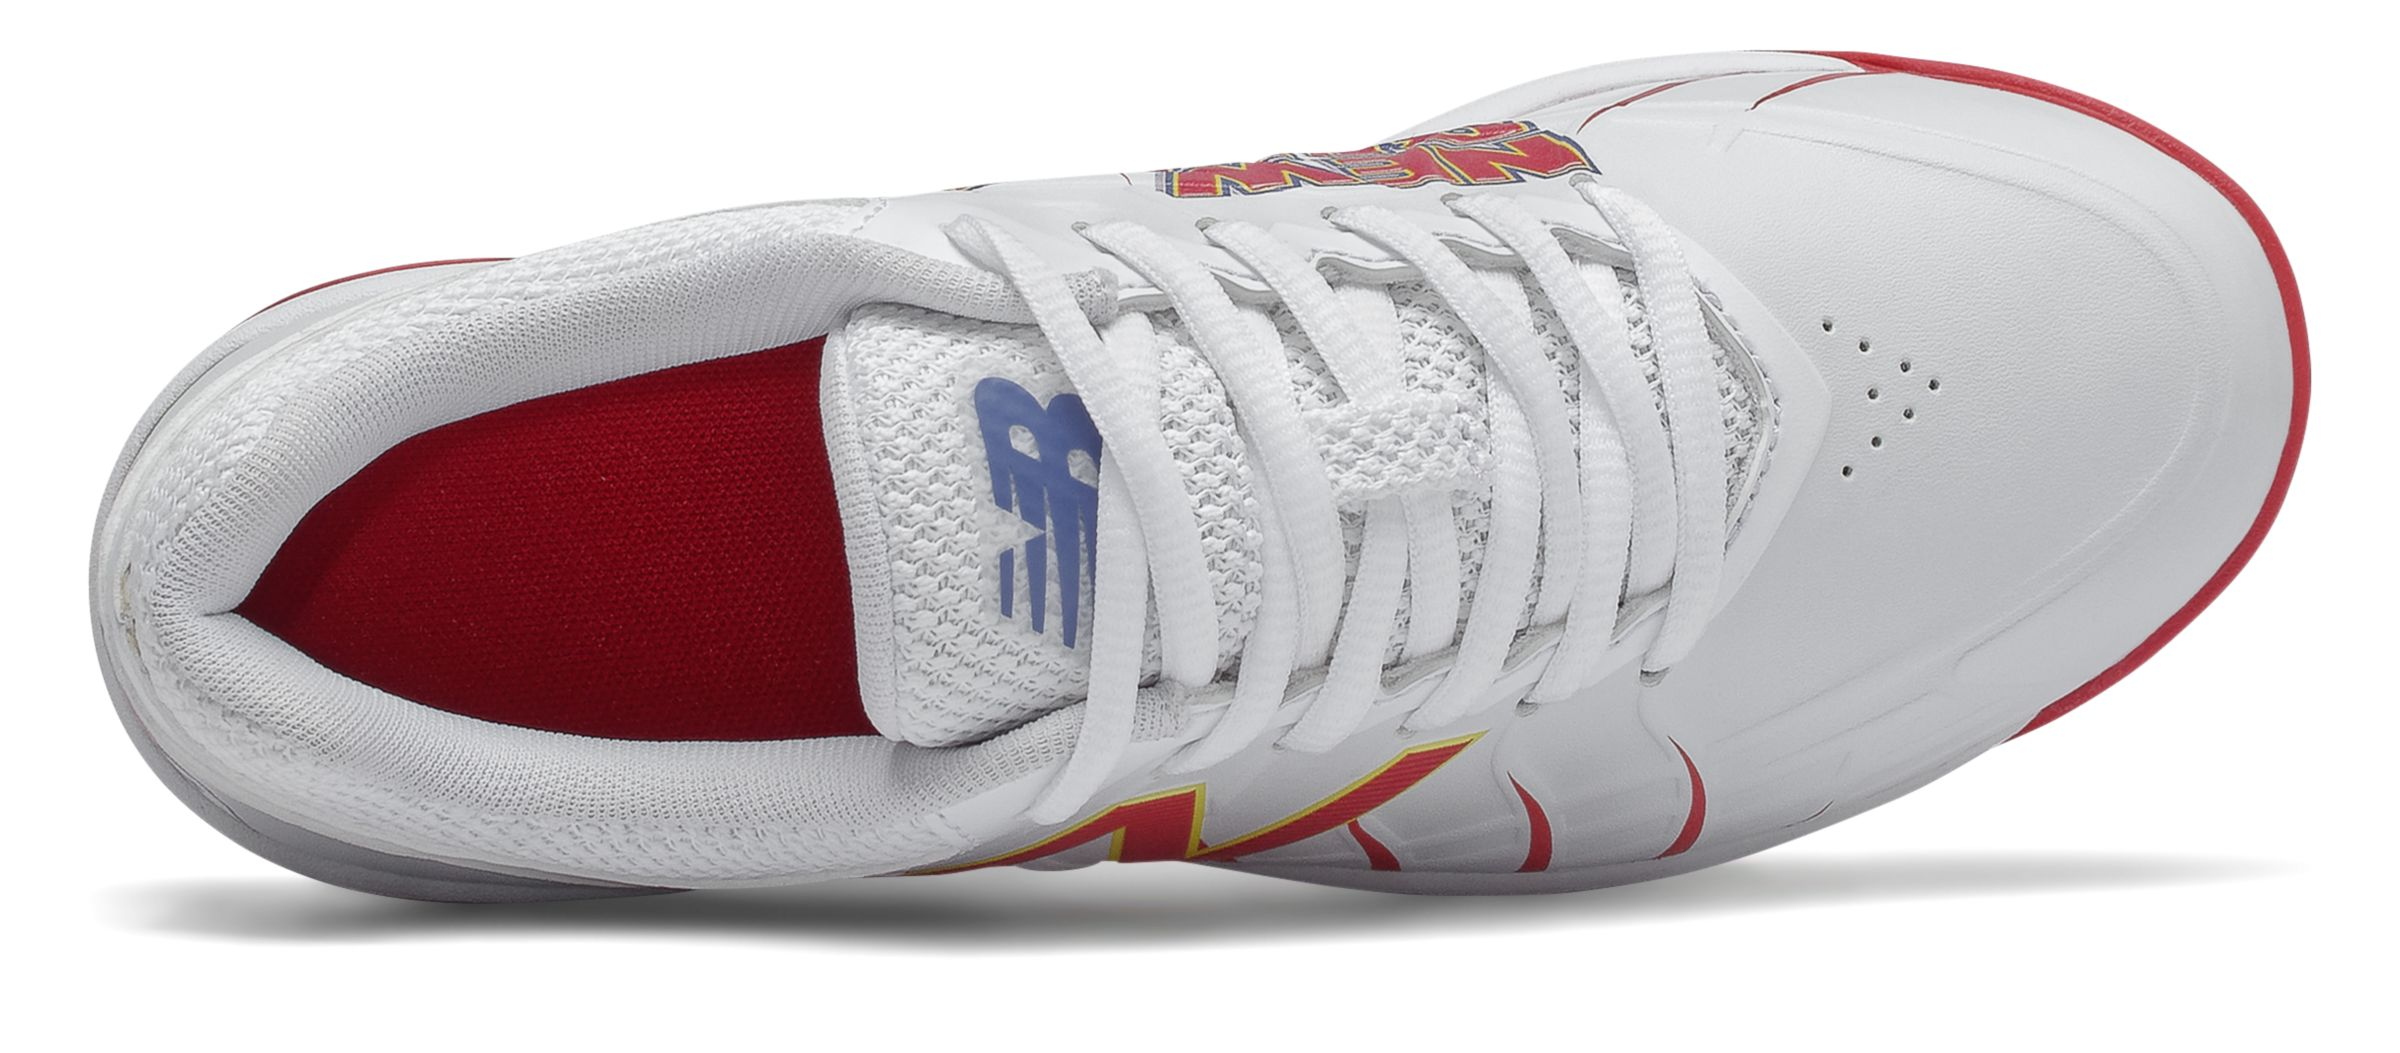 23++ Big league chew new balance shoes ideas information